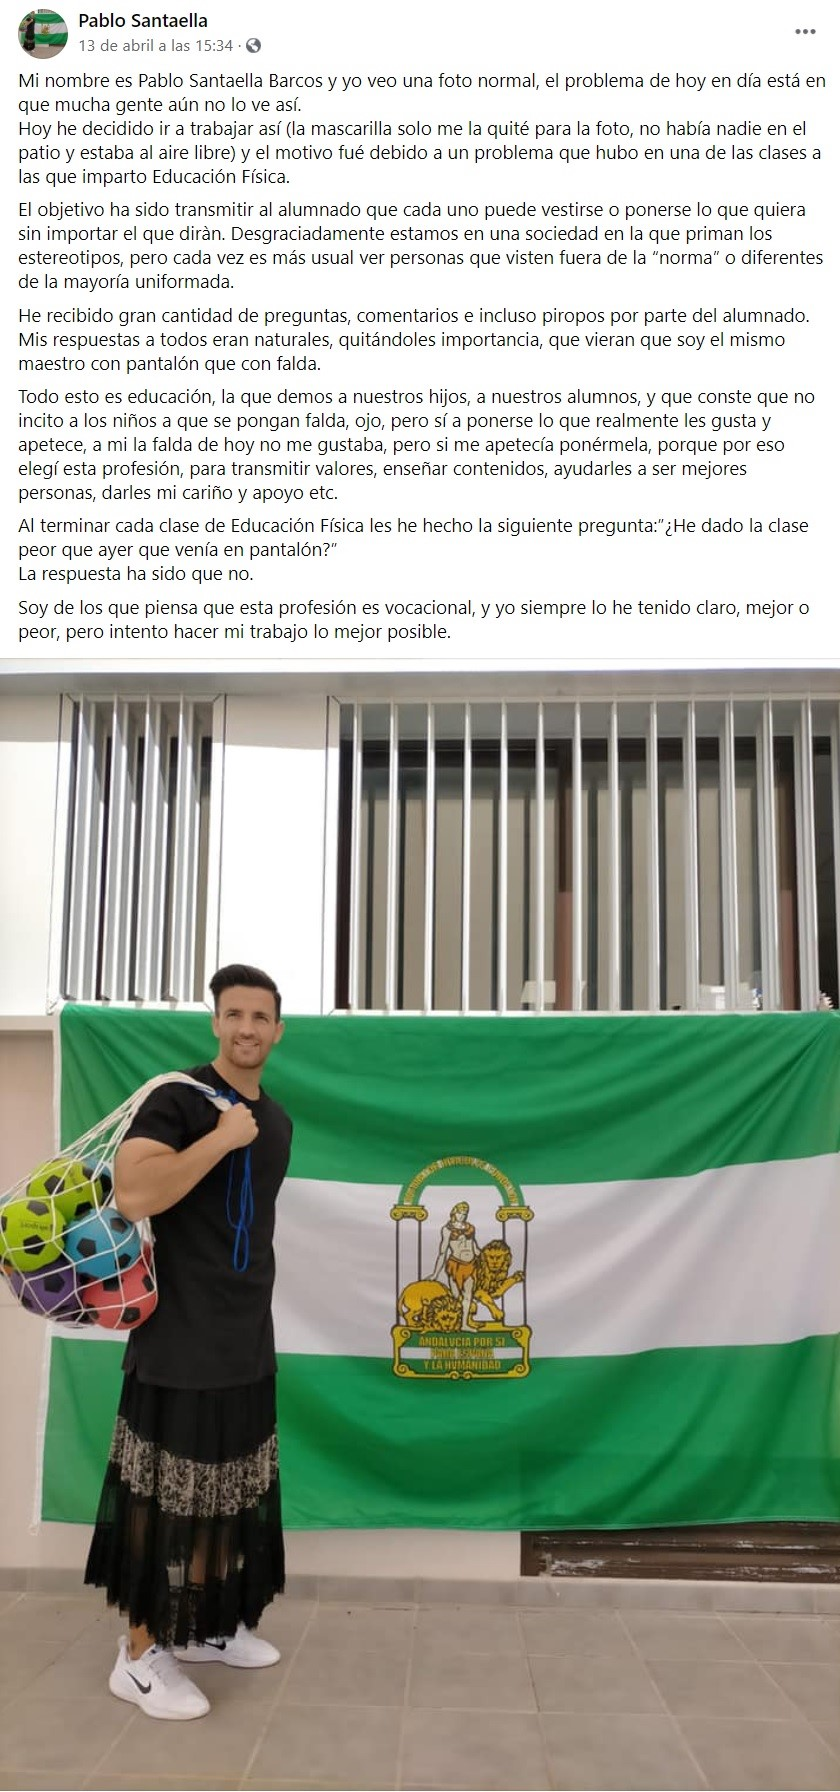 PROFESOR DE INSTITUTO CON FALDA